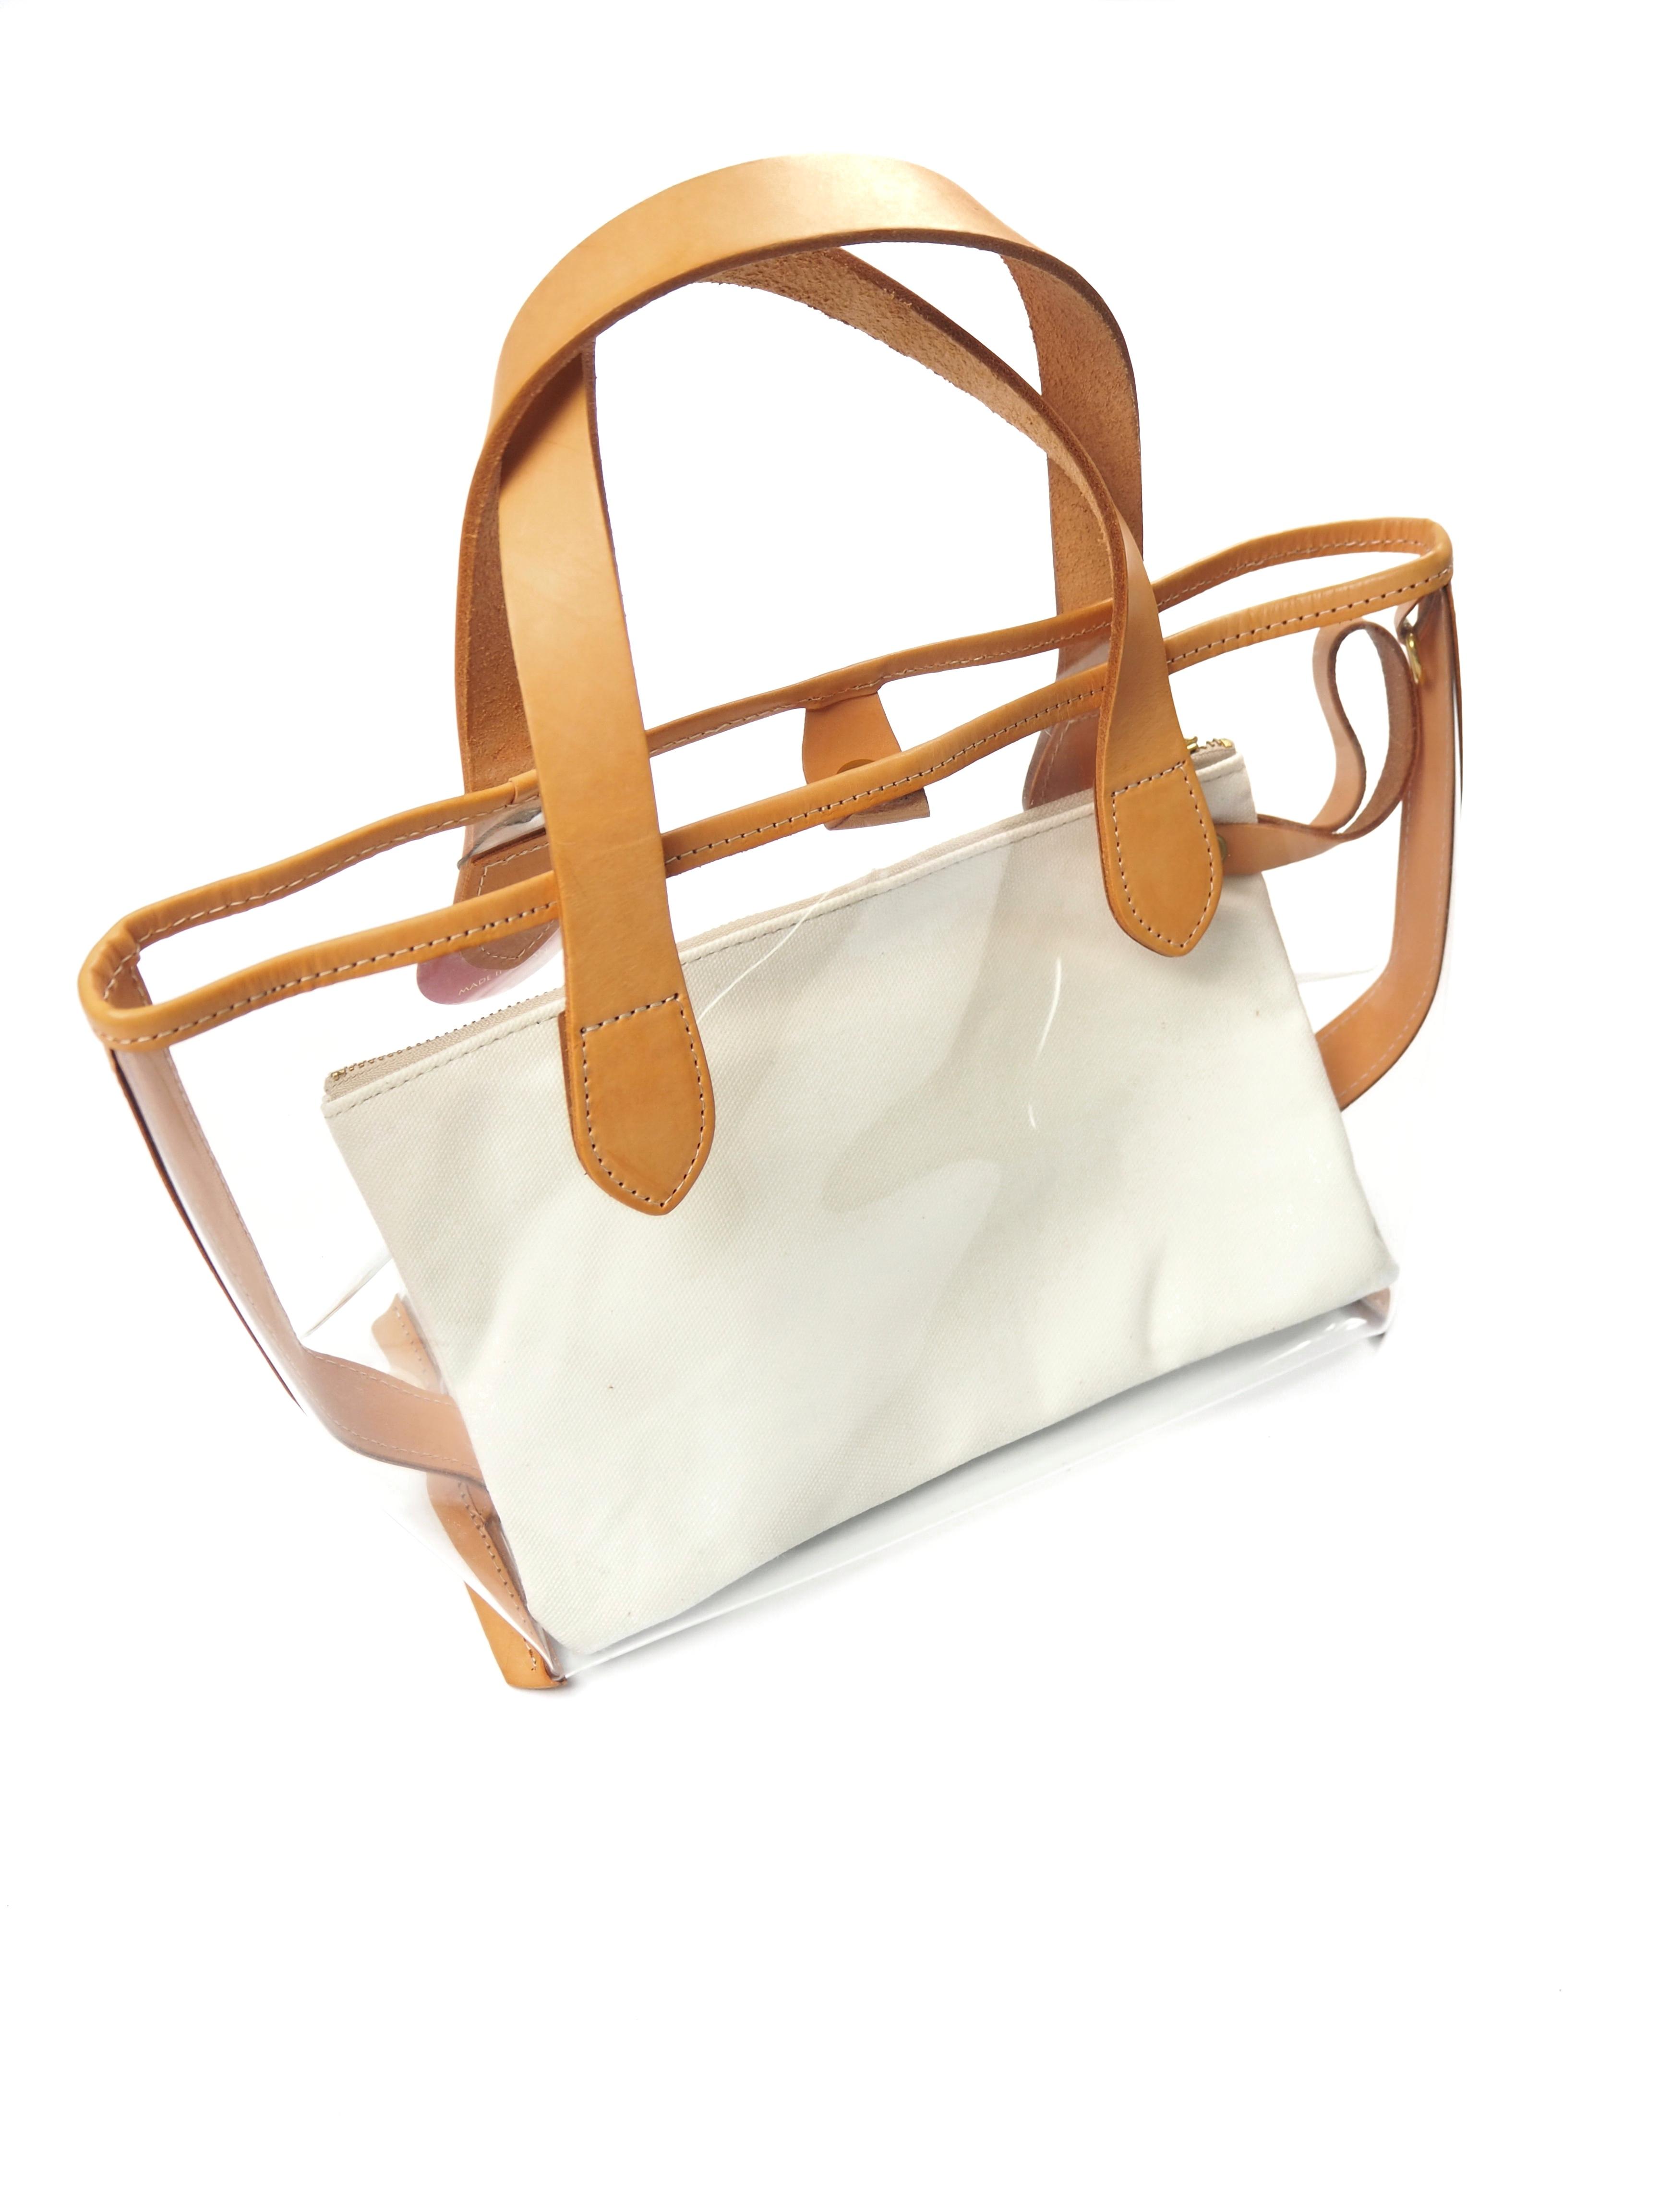 【U3GI】CLEAR BUCKET BAG